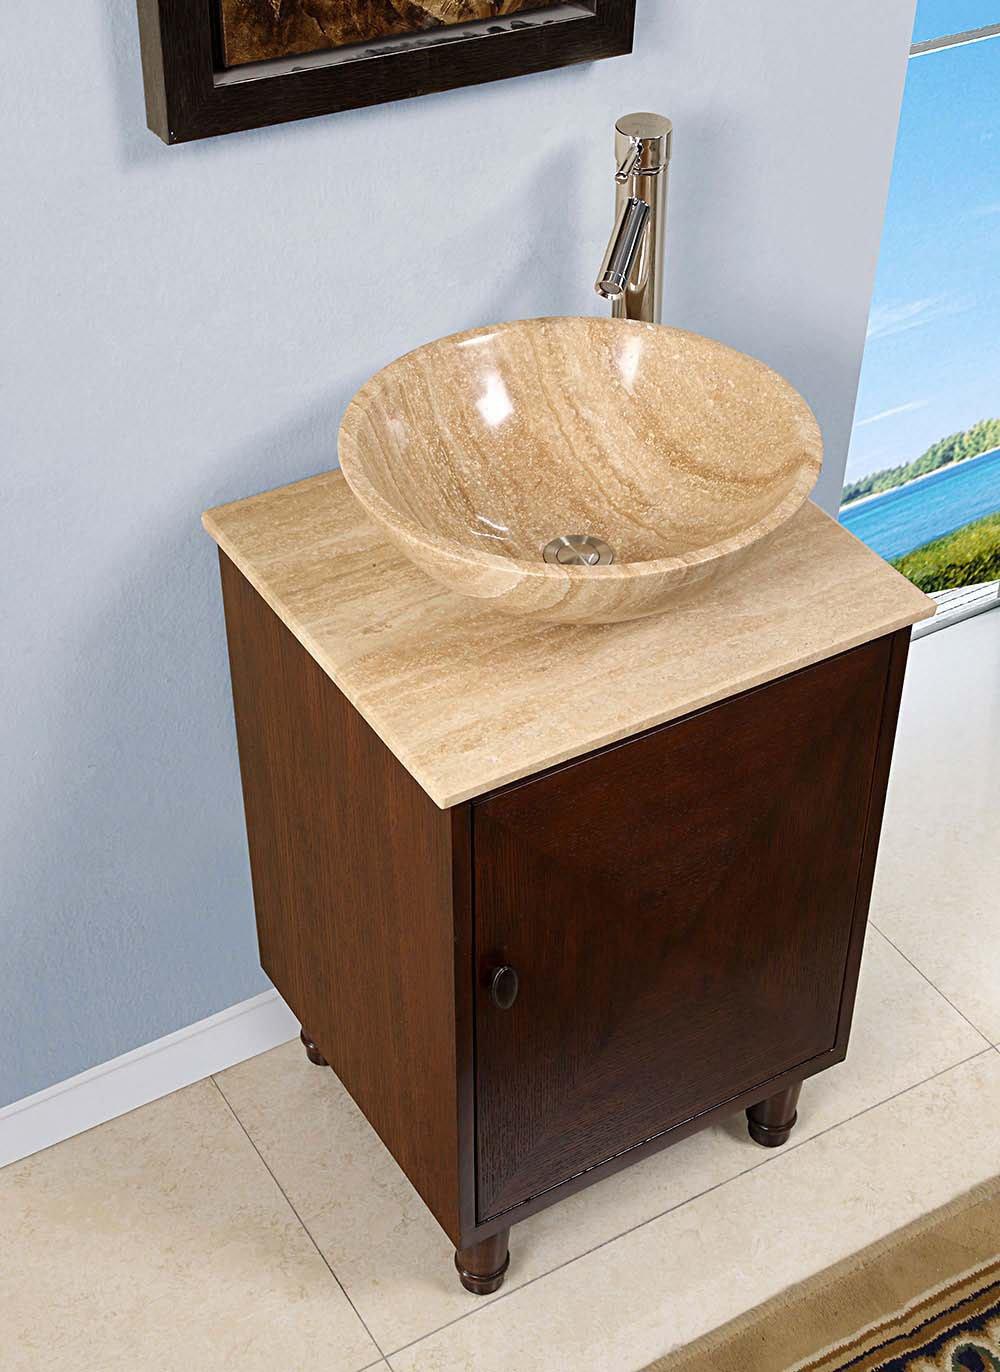 20 inch travertine vessel sink vanity